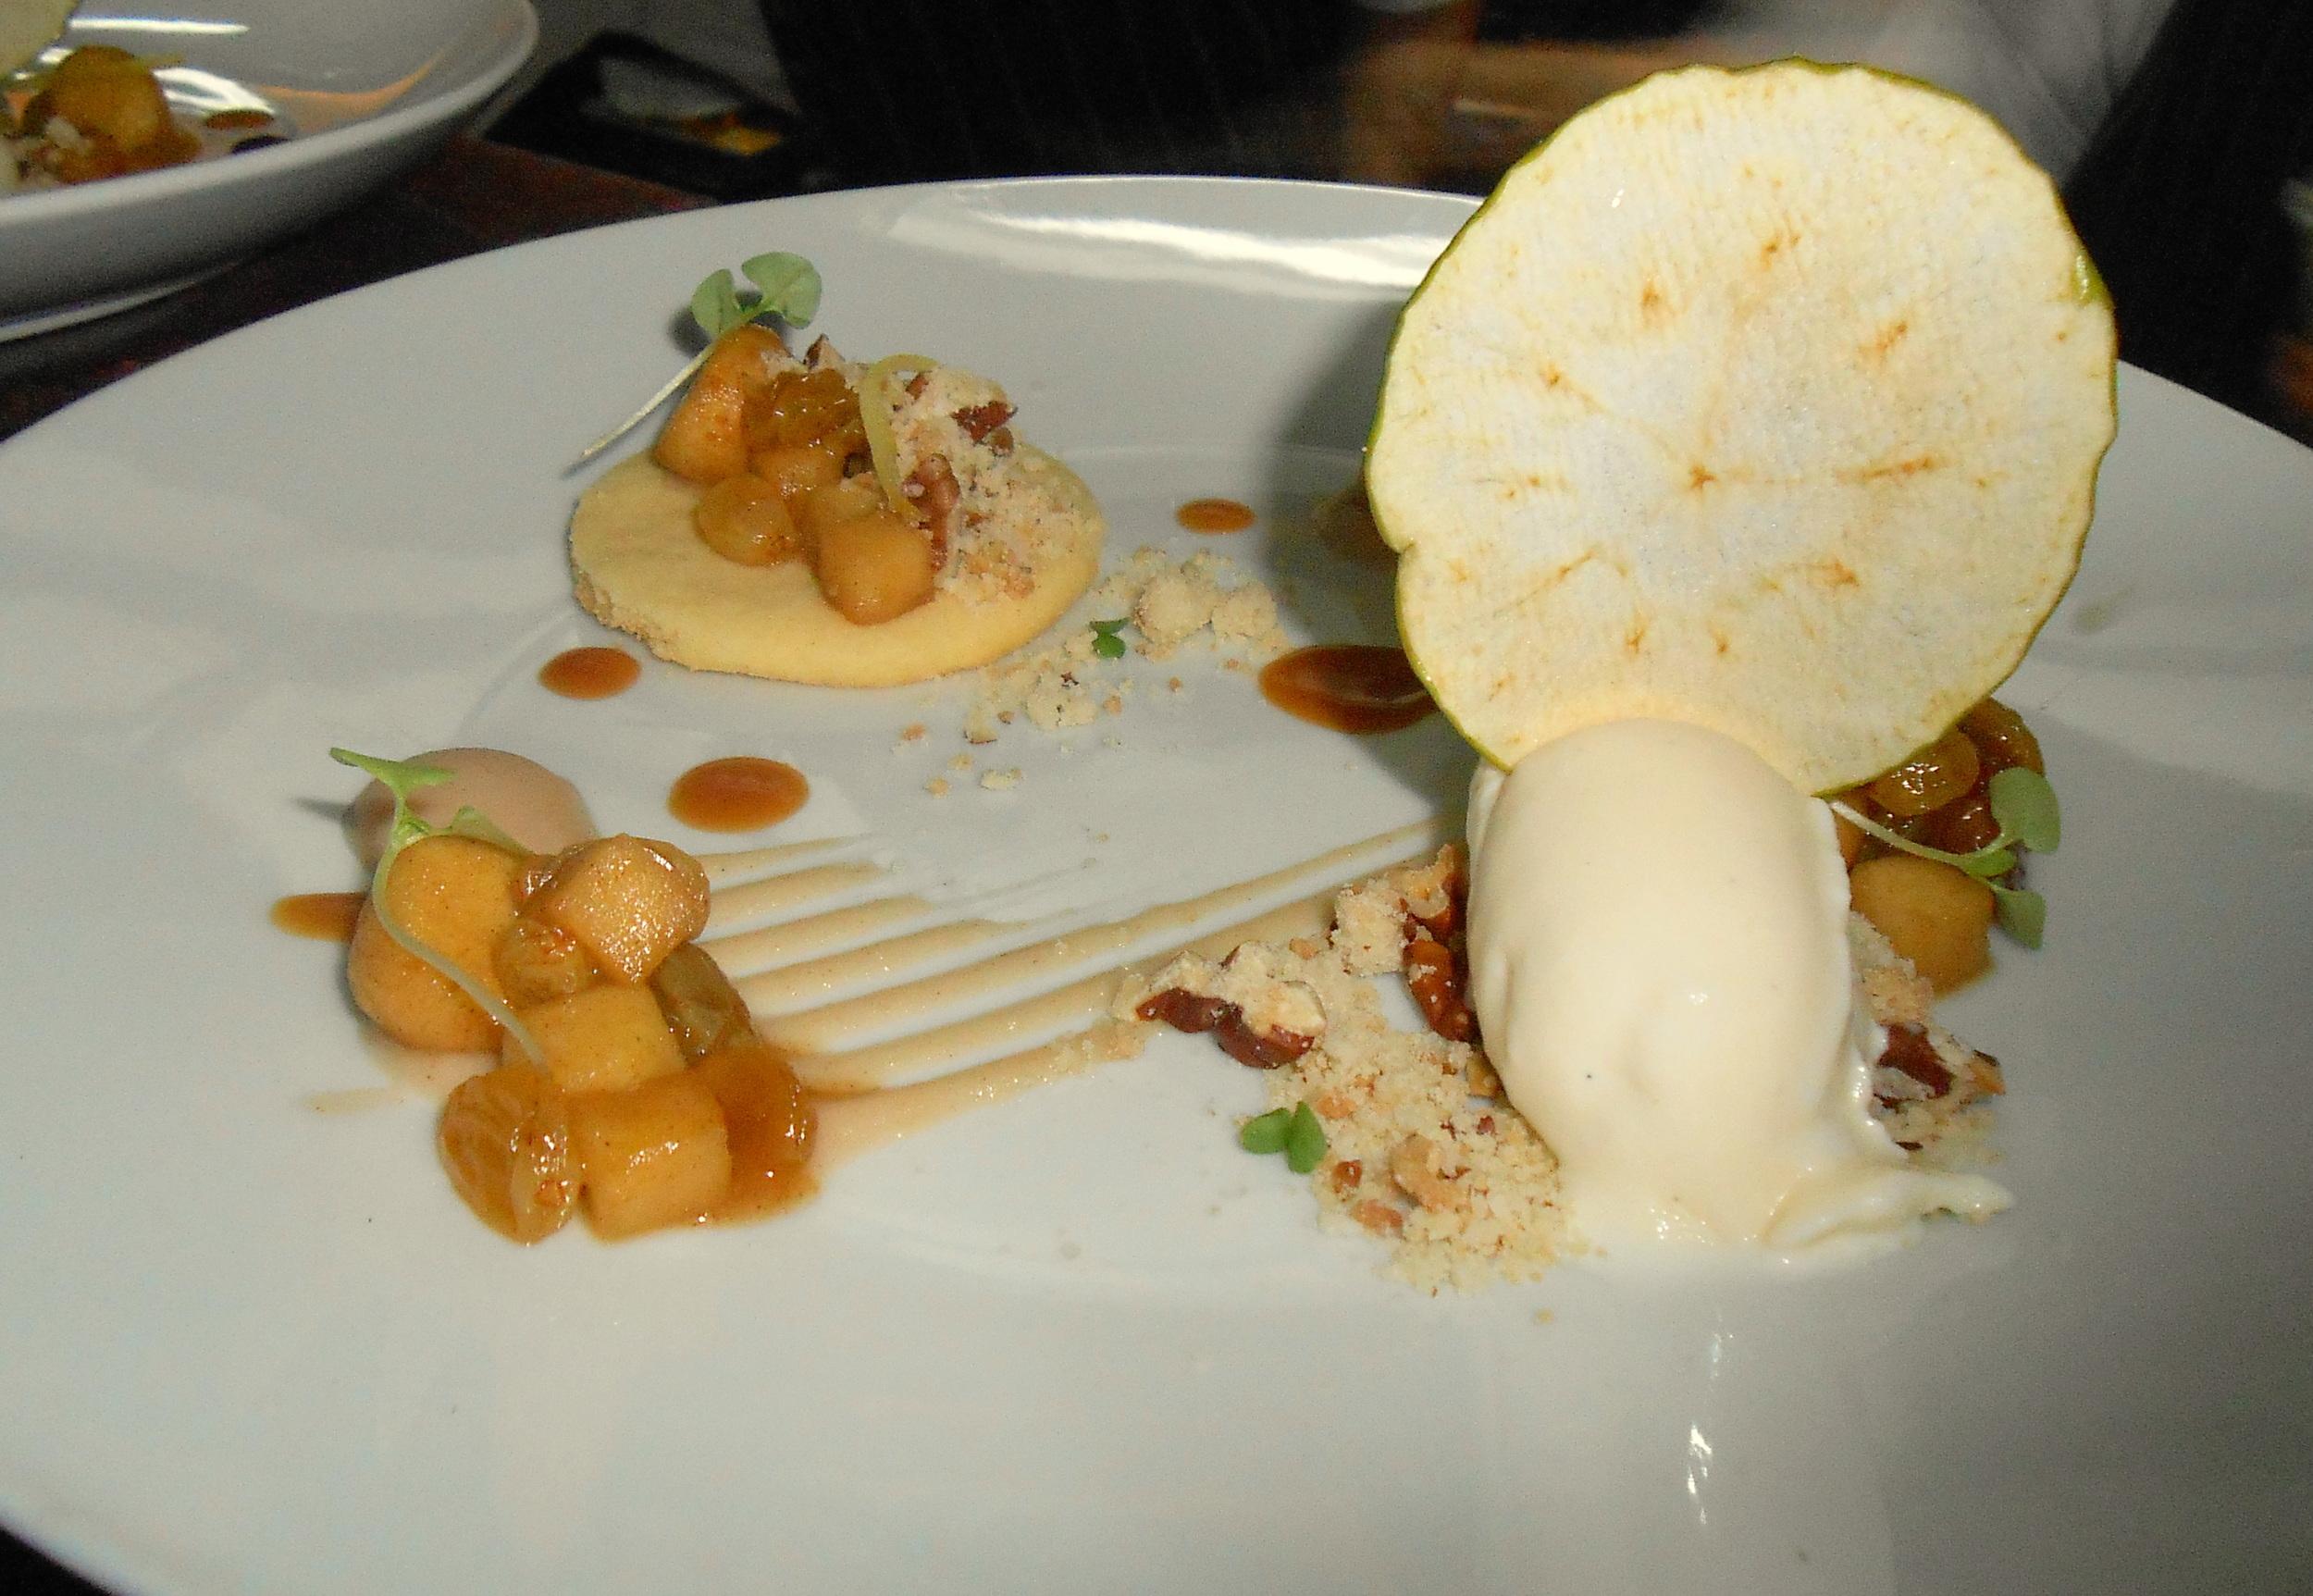 Deconstructed apple tart, with short bread, gala apple, pecan crumb, salted caramel, and vanilla bean gelato